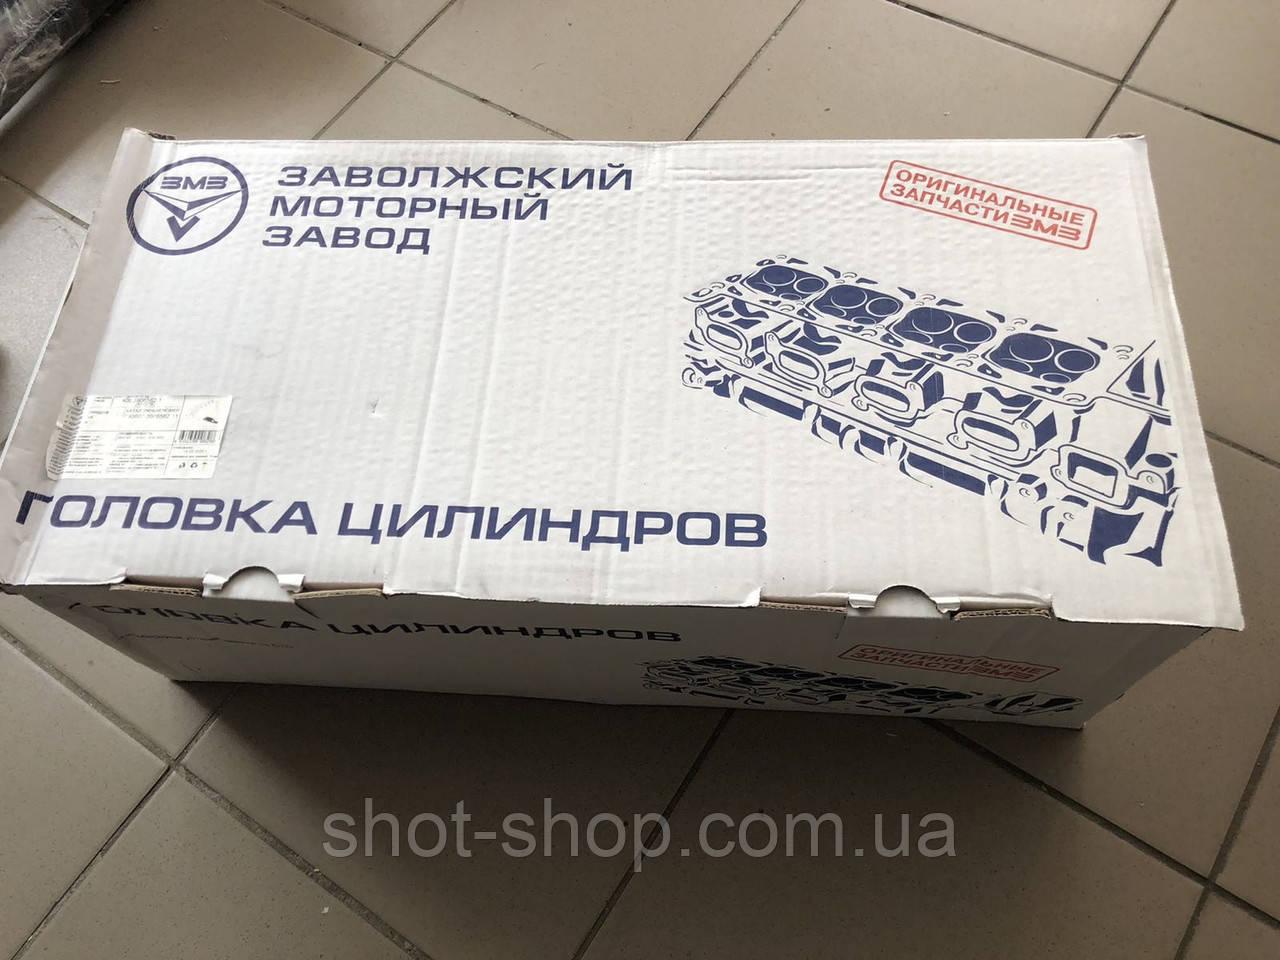 Головка блока цилиндров ГБЦ (дв.409) УАЗ .ГАЗель